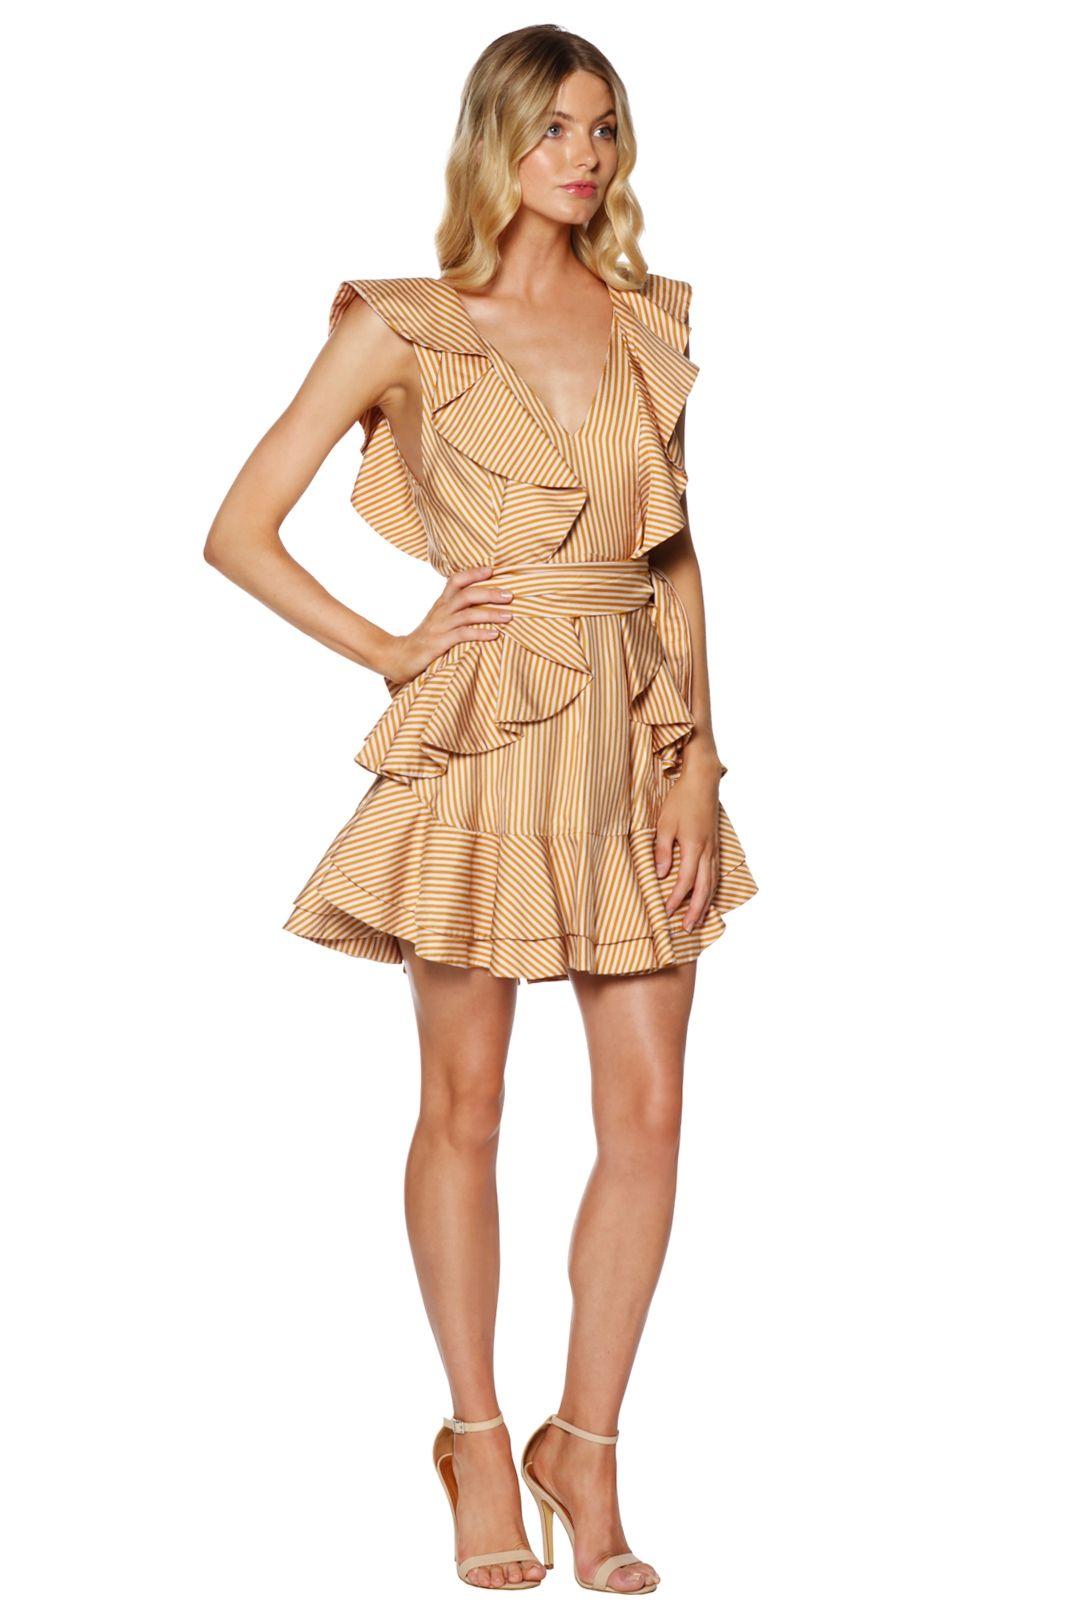 Zimmermann - Winsome Flounce Dress - Gold - Side